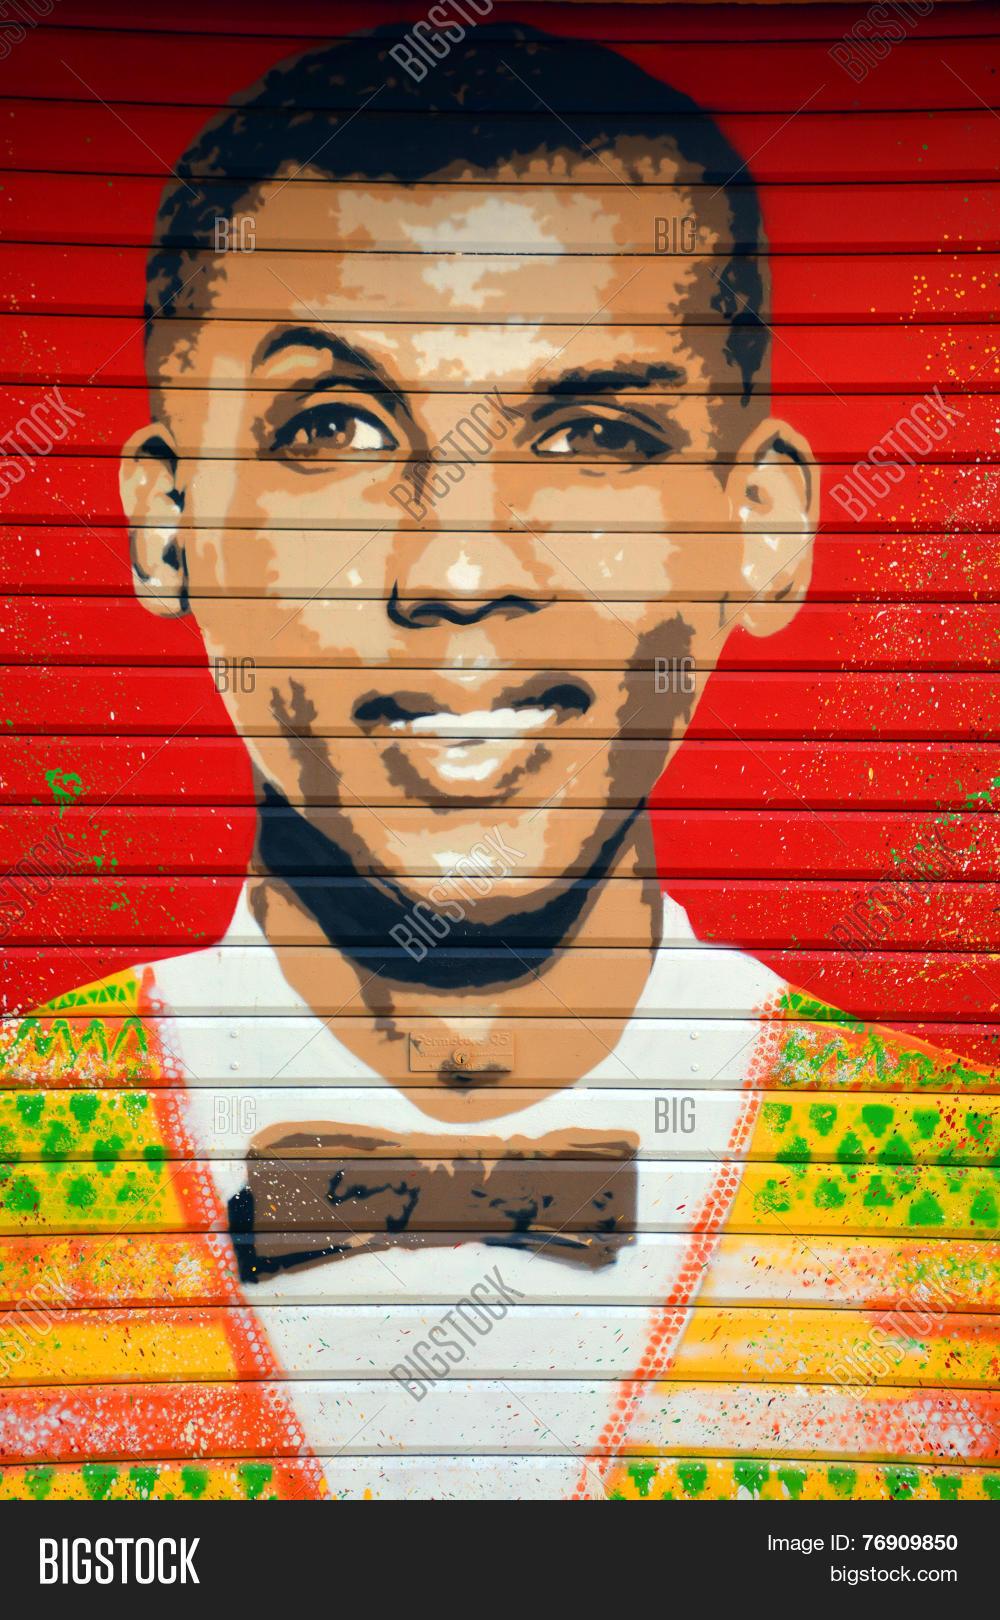 street art belge image photo free trial bigstock